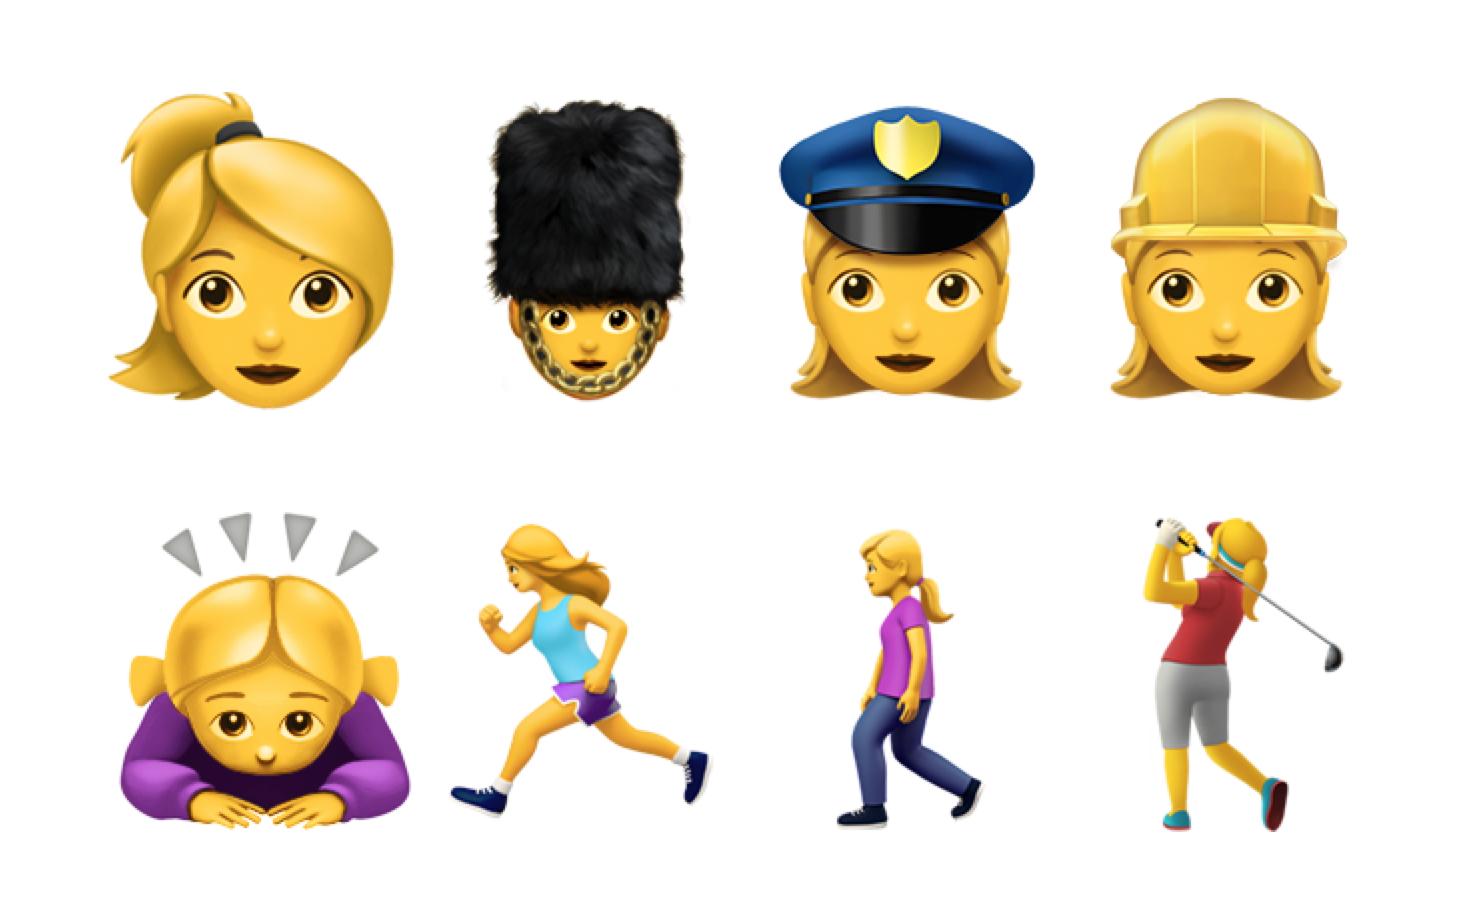 iOS 10 2 Emoji First Look: Shrug, Fingers Crossed, Face Palm